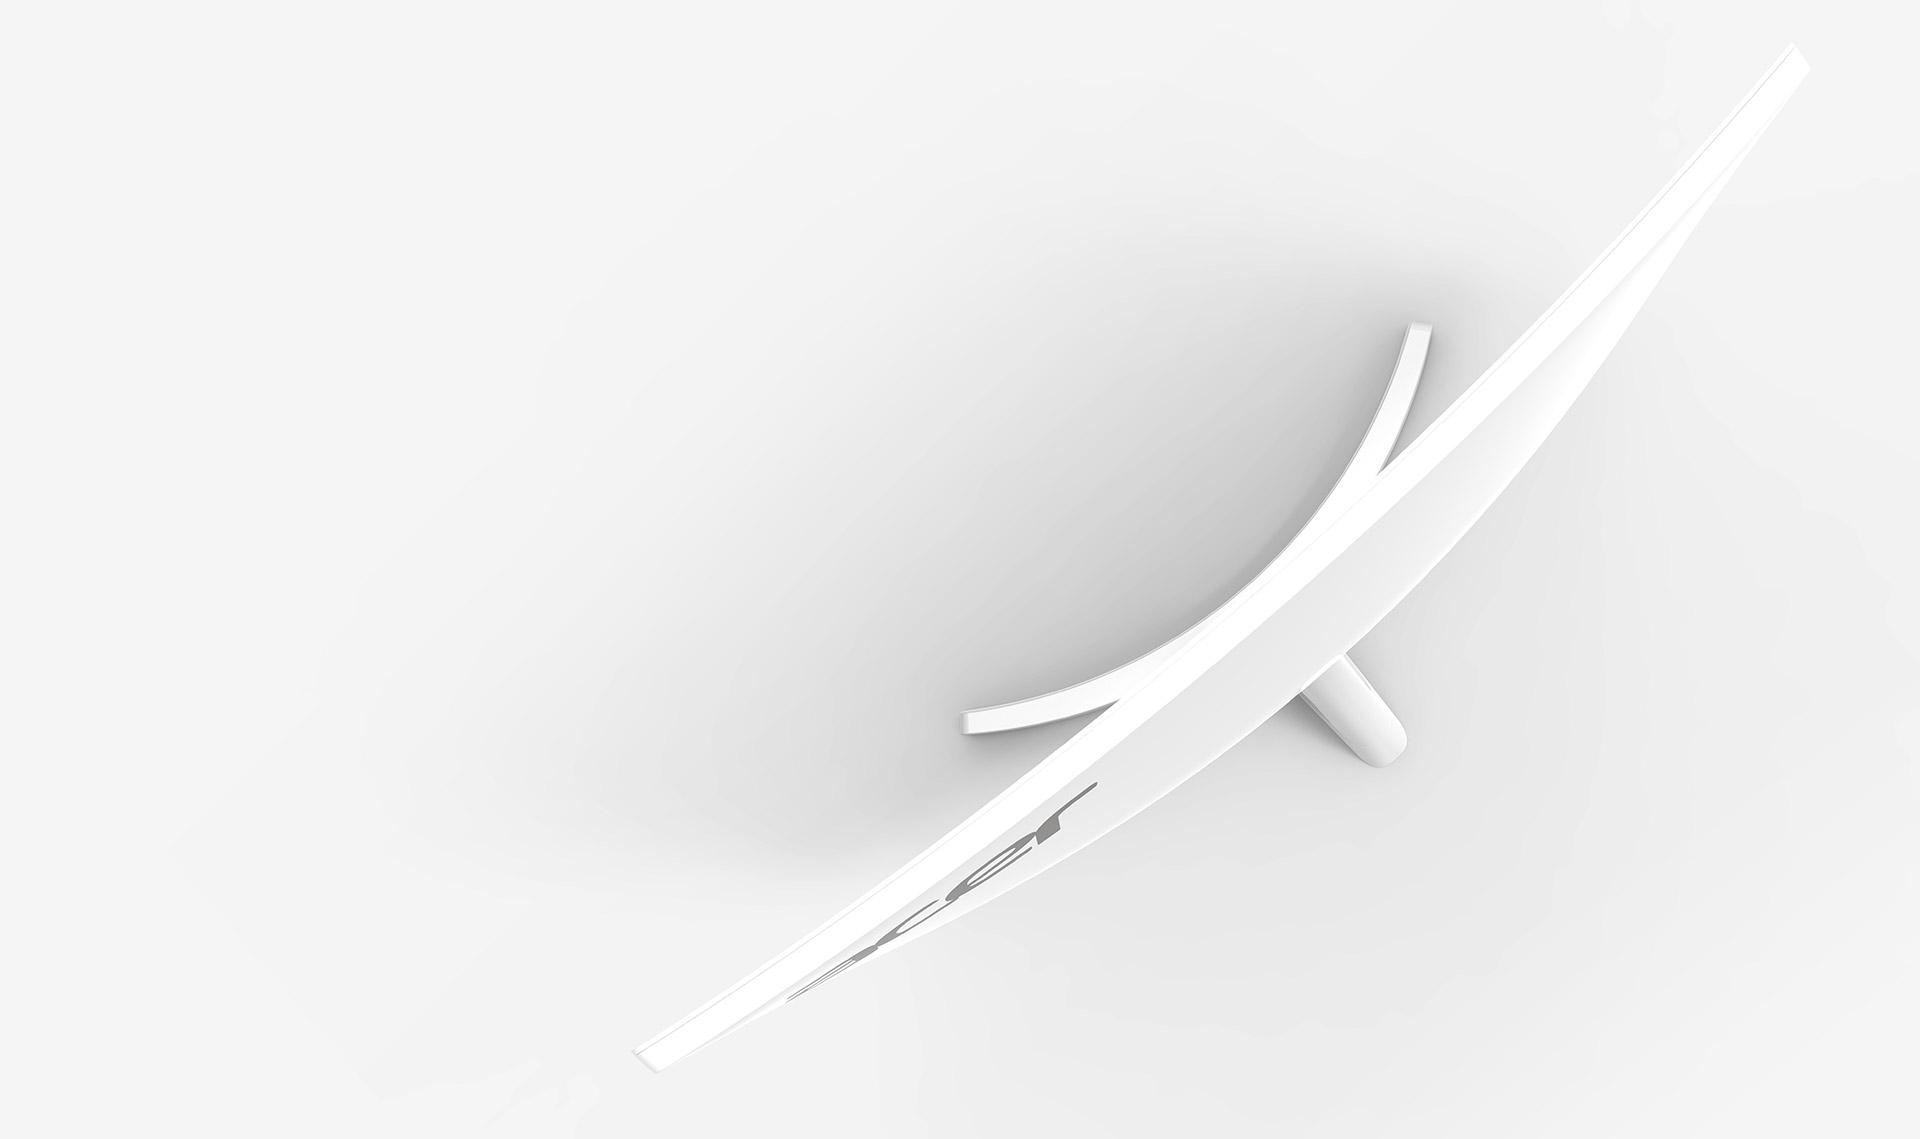 Acer ED2 Series ksp - Large